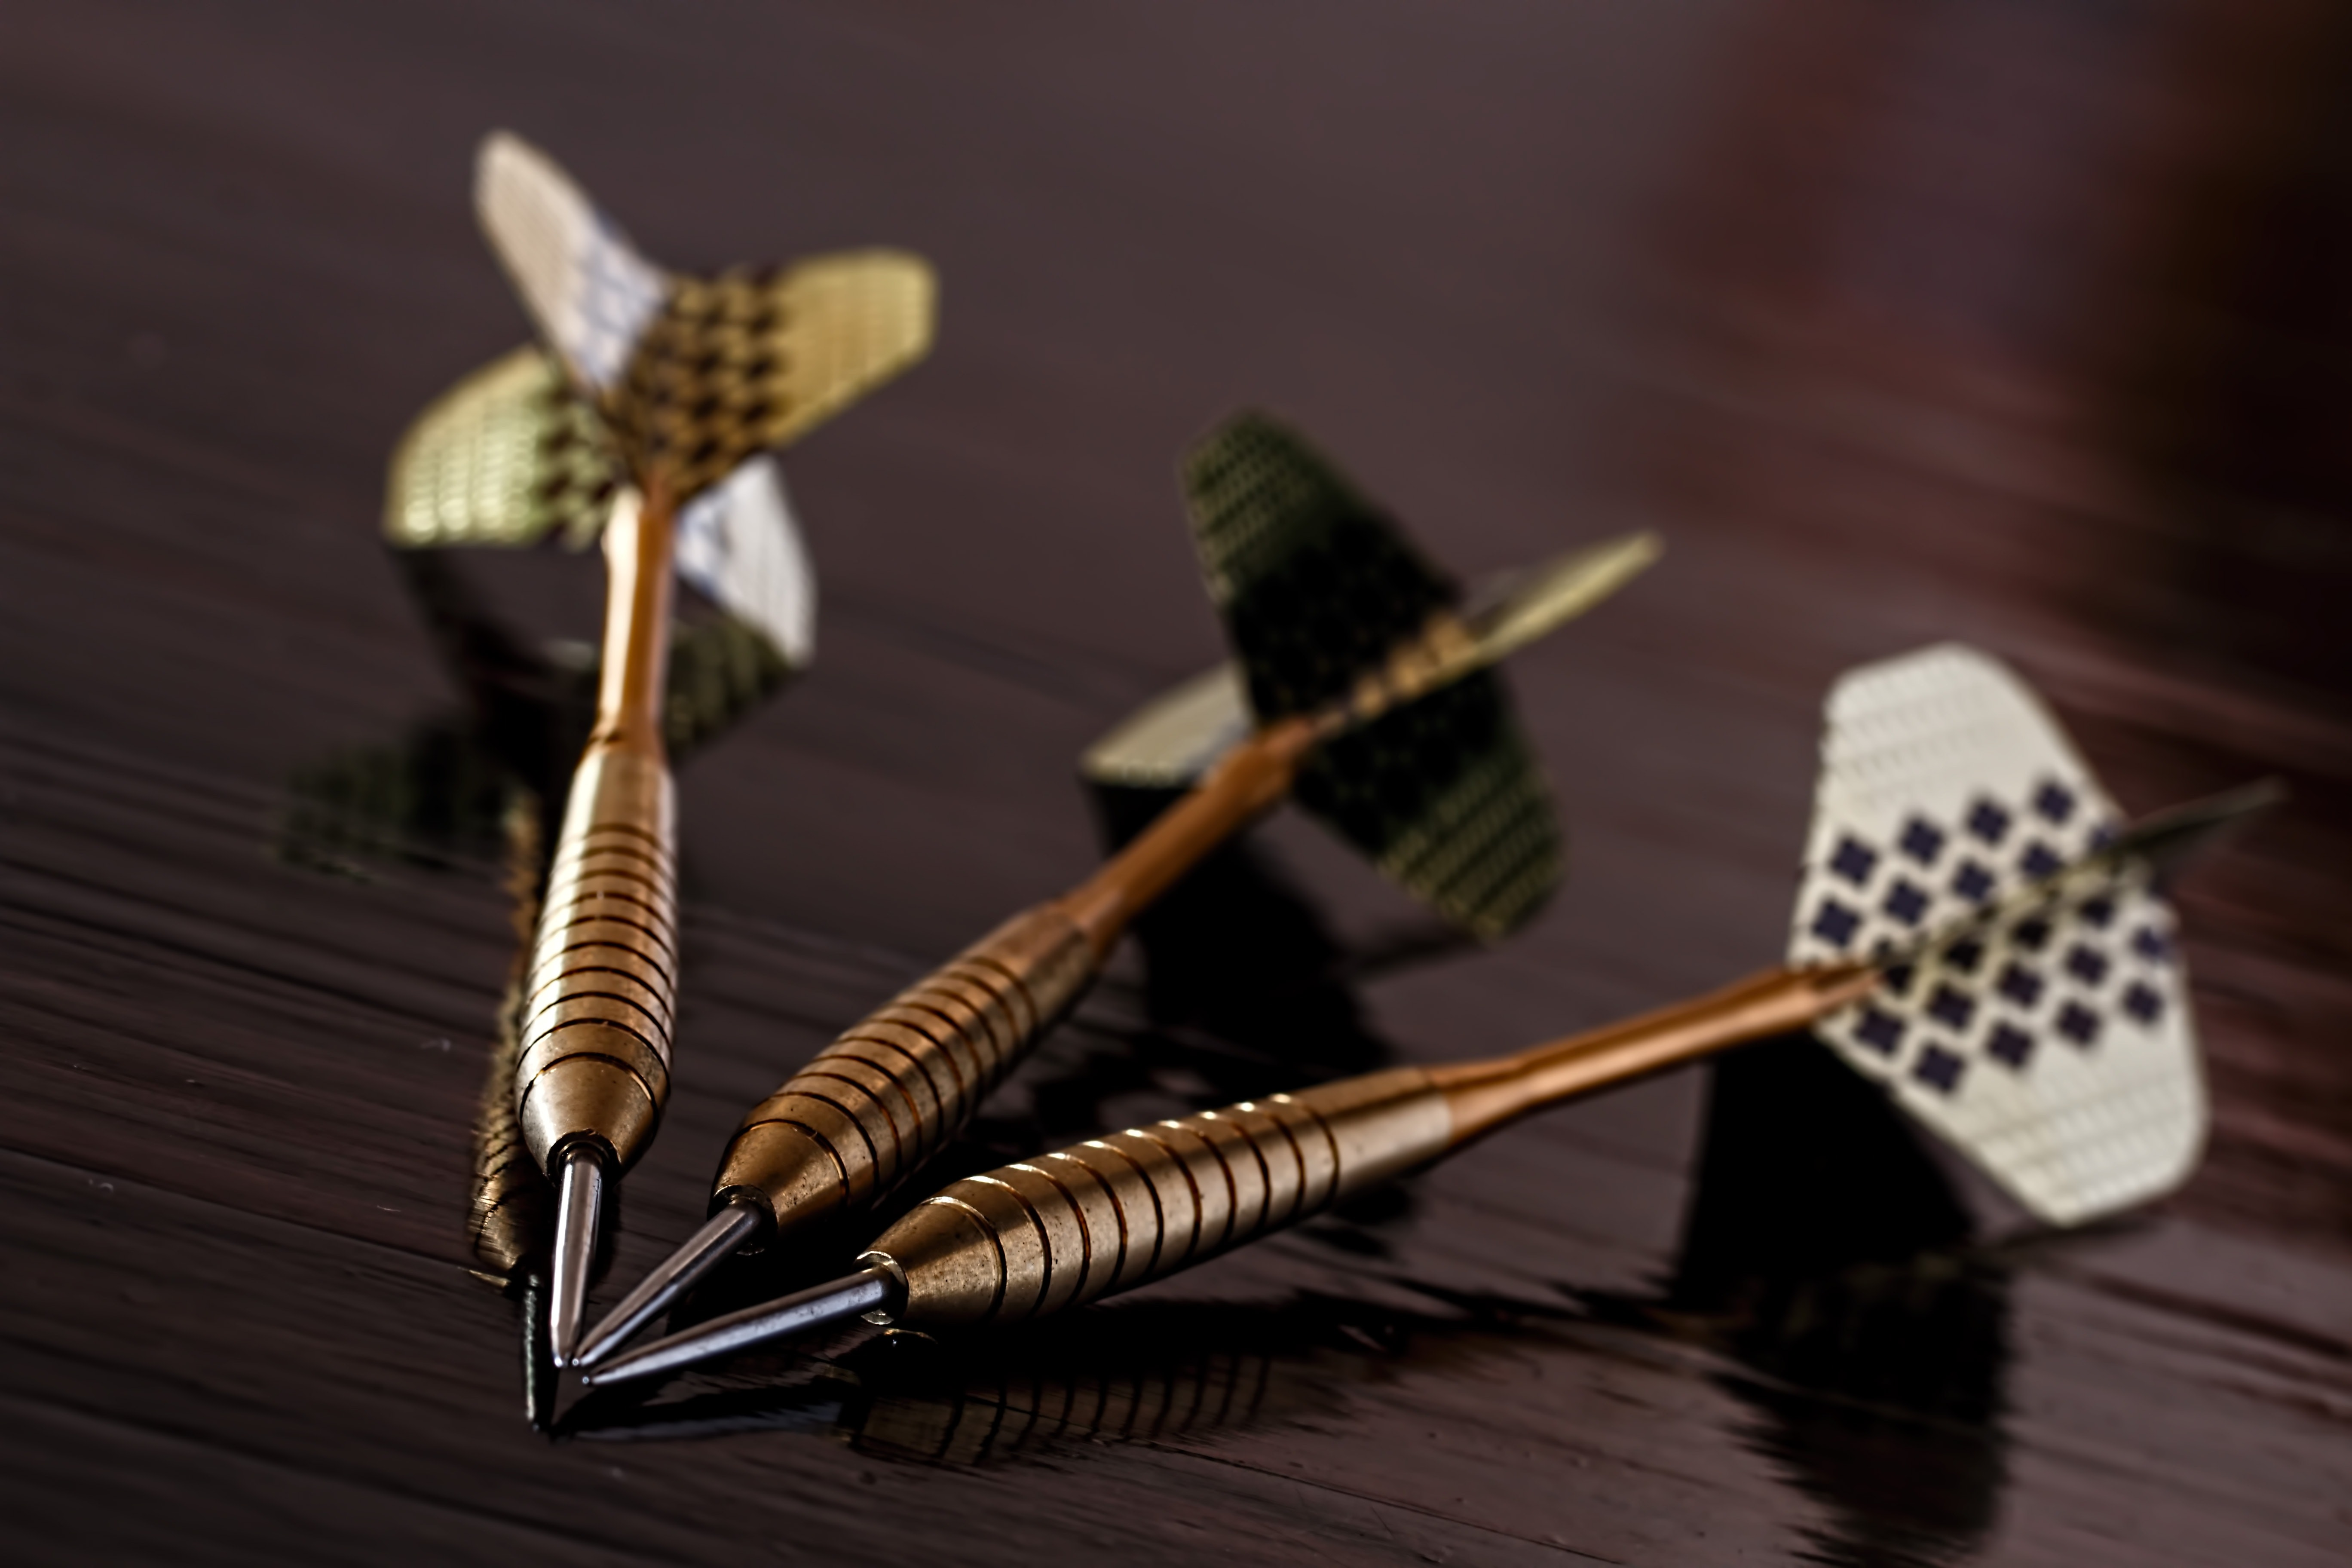 aim-arrow-dart-pins-39551.jpg